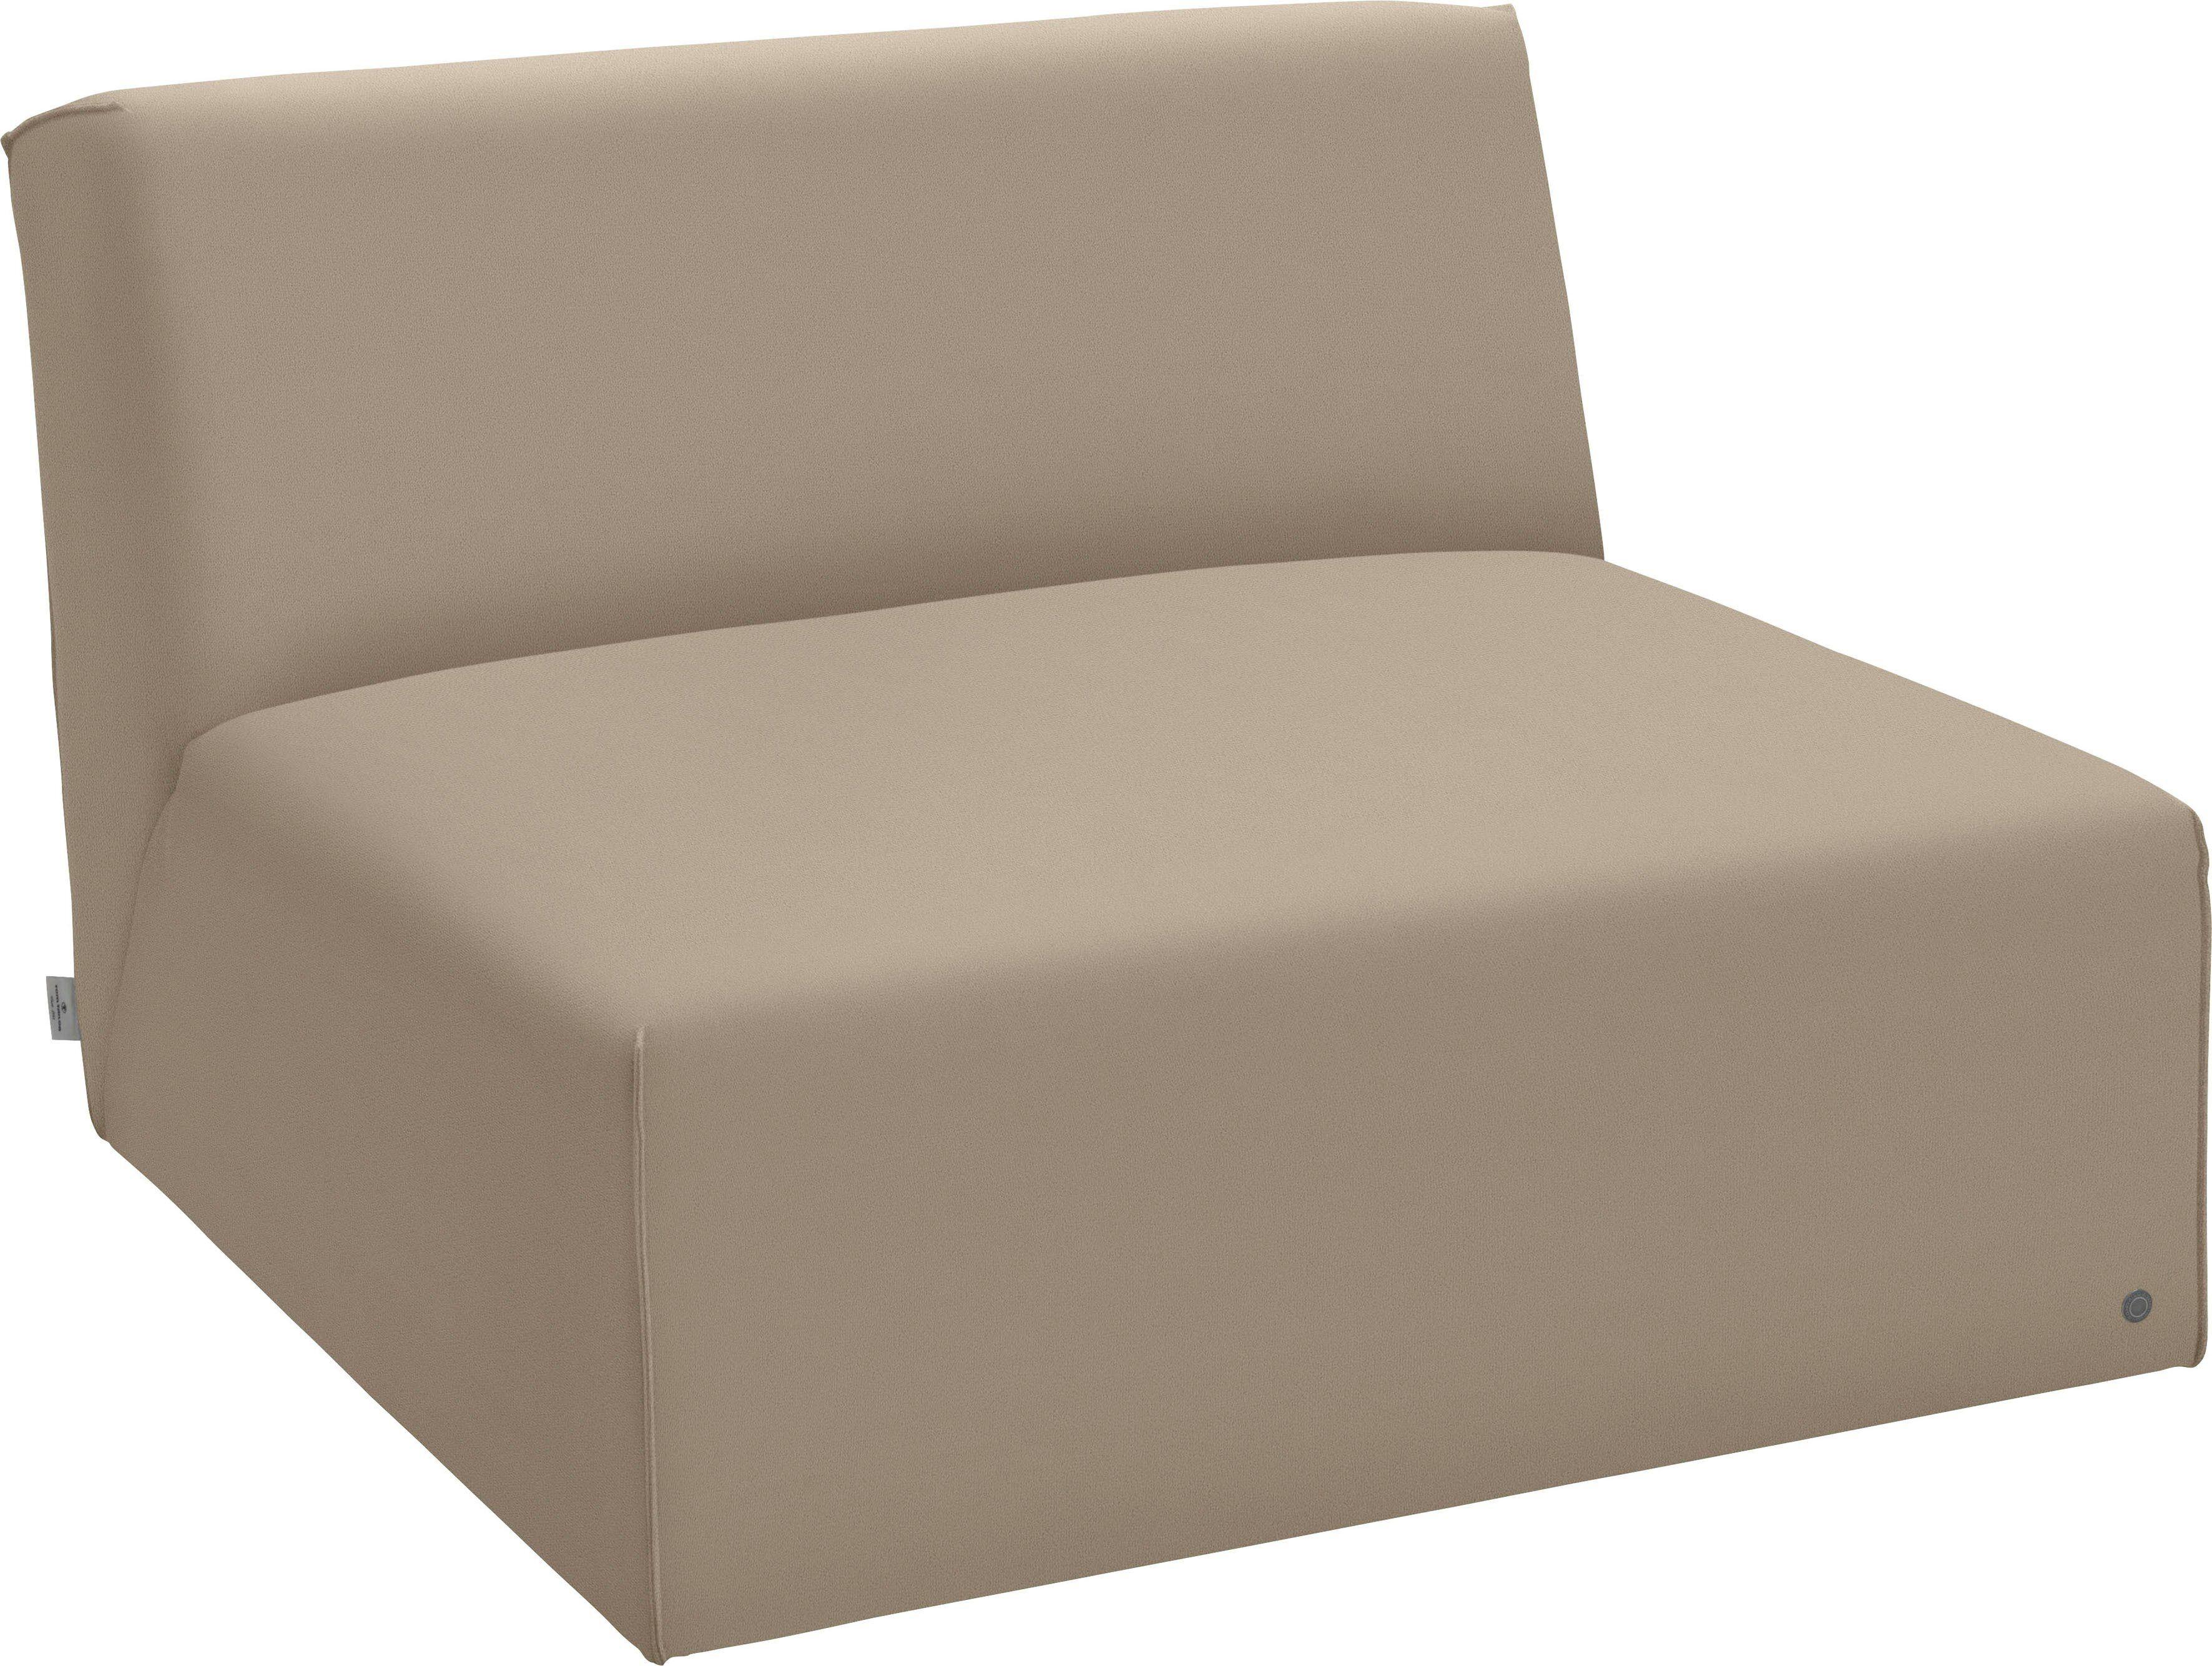 TOM TAILOR Sofaelement »ELEMENTS«, Sitzelement ohne Armlehne, dune TSV 12